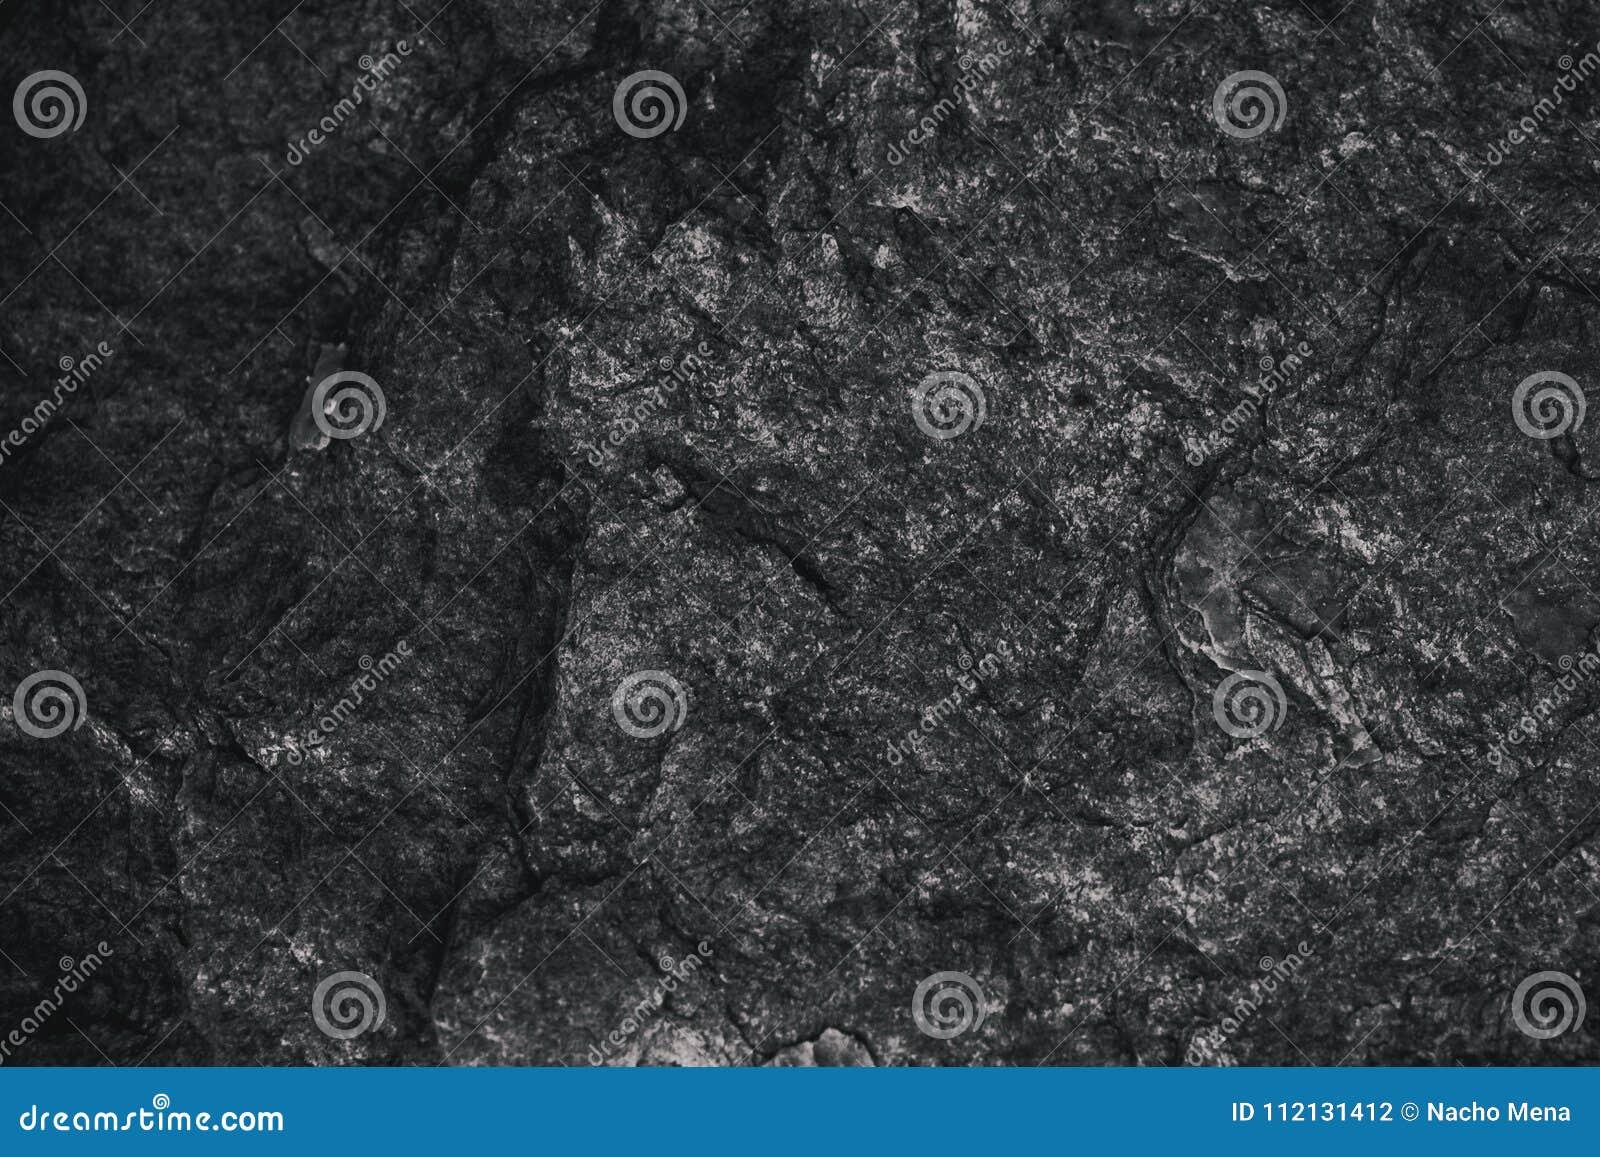 Rough Texture Background: Closeup Of Dark Textured Background. Gray Rough Texture